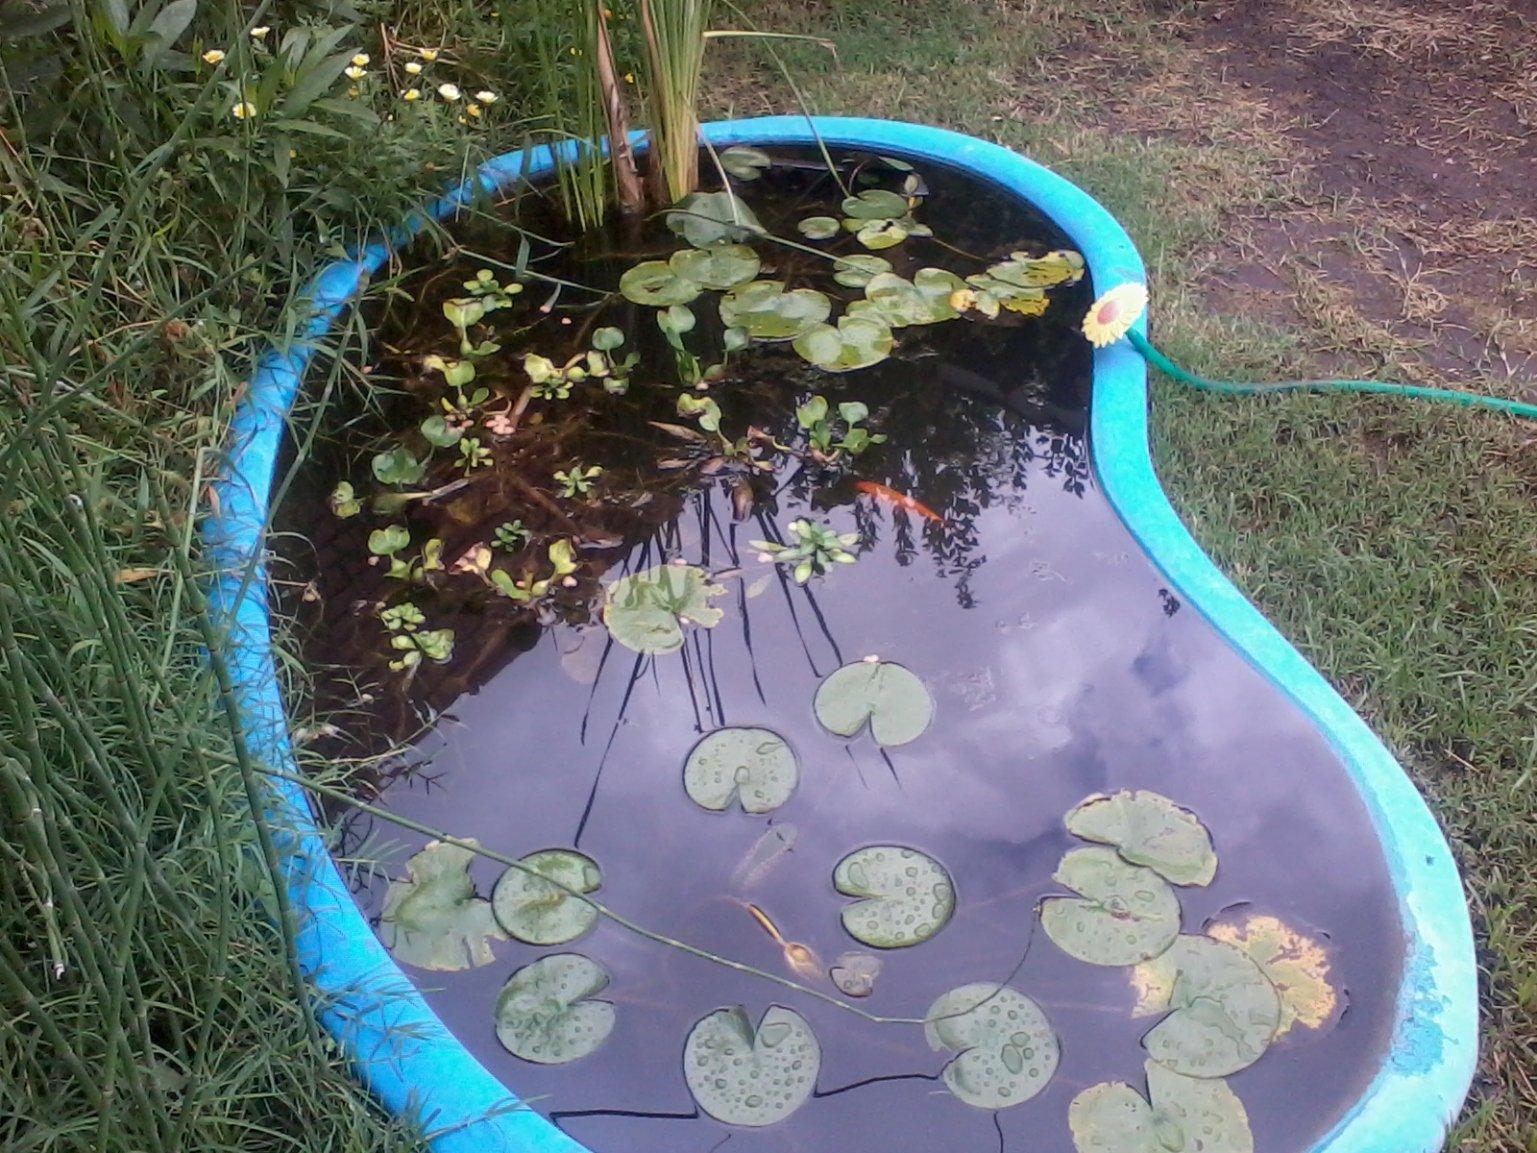 Como hacer una pileta de agua casera con maravillosas ideas for Fuentes de agua con peces